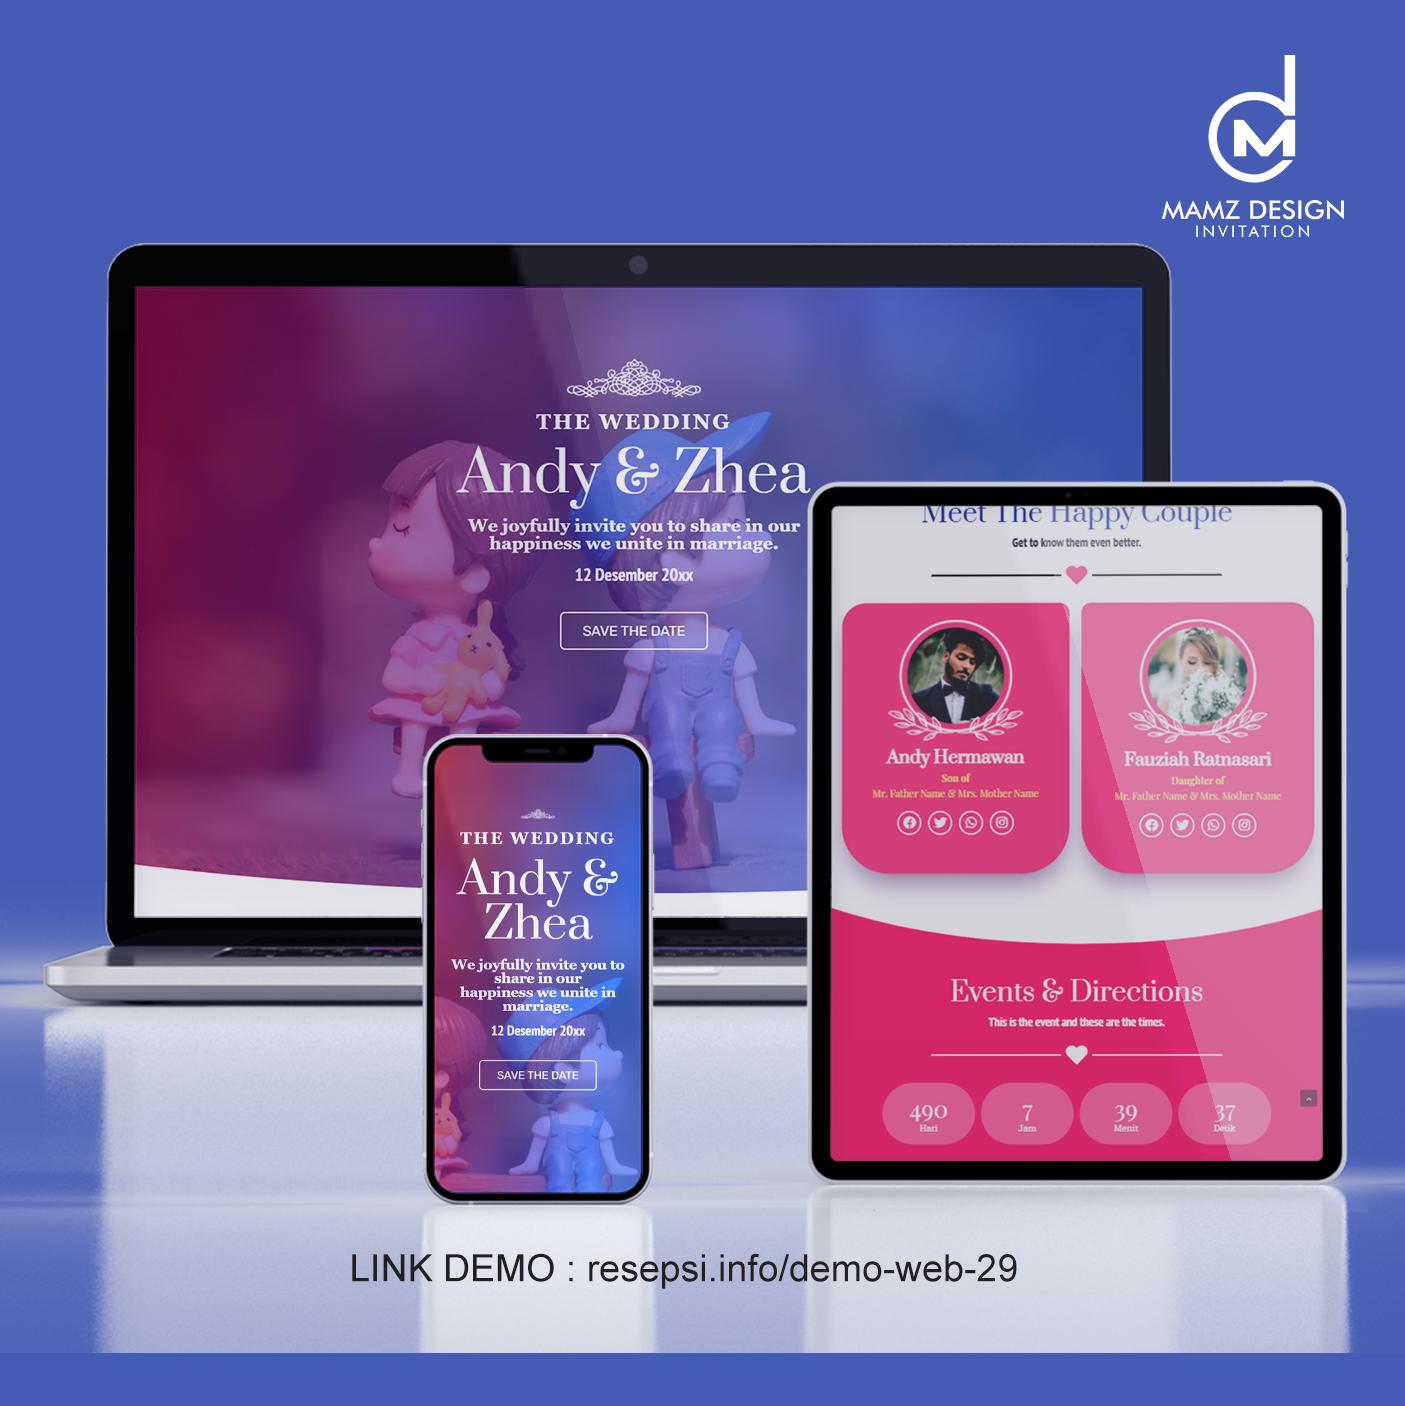 Demo Web 29